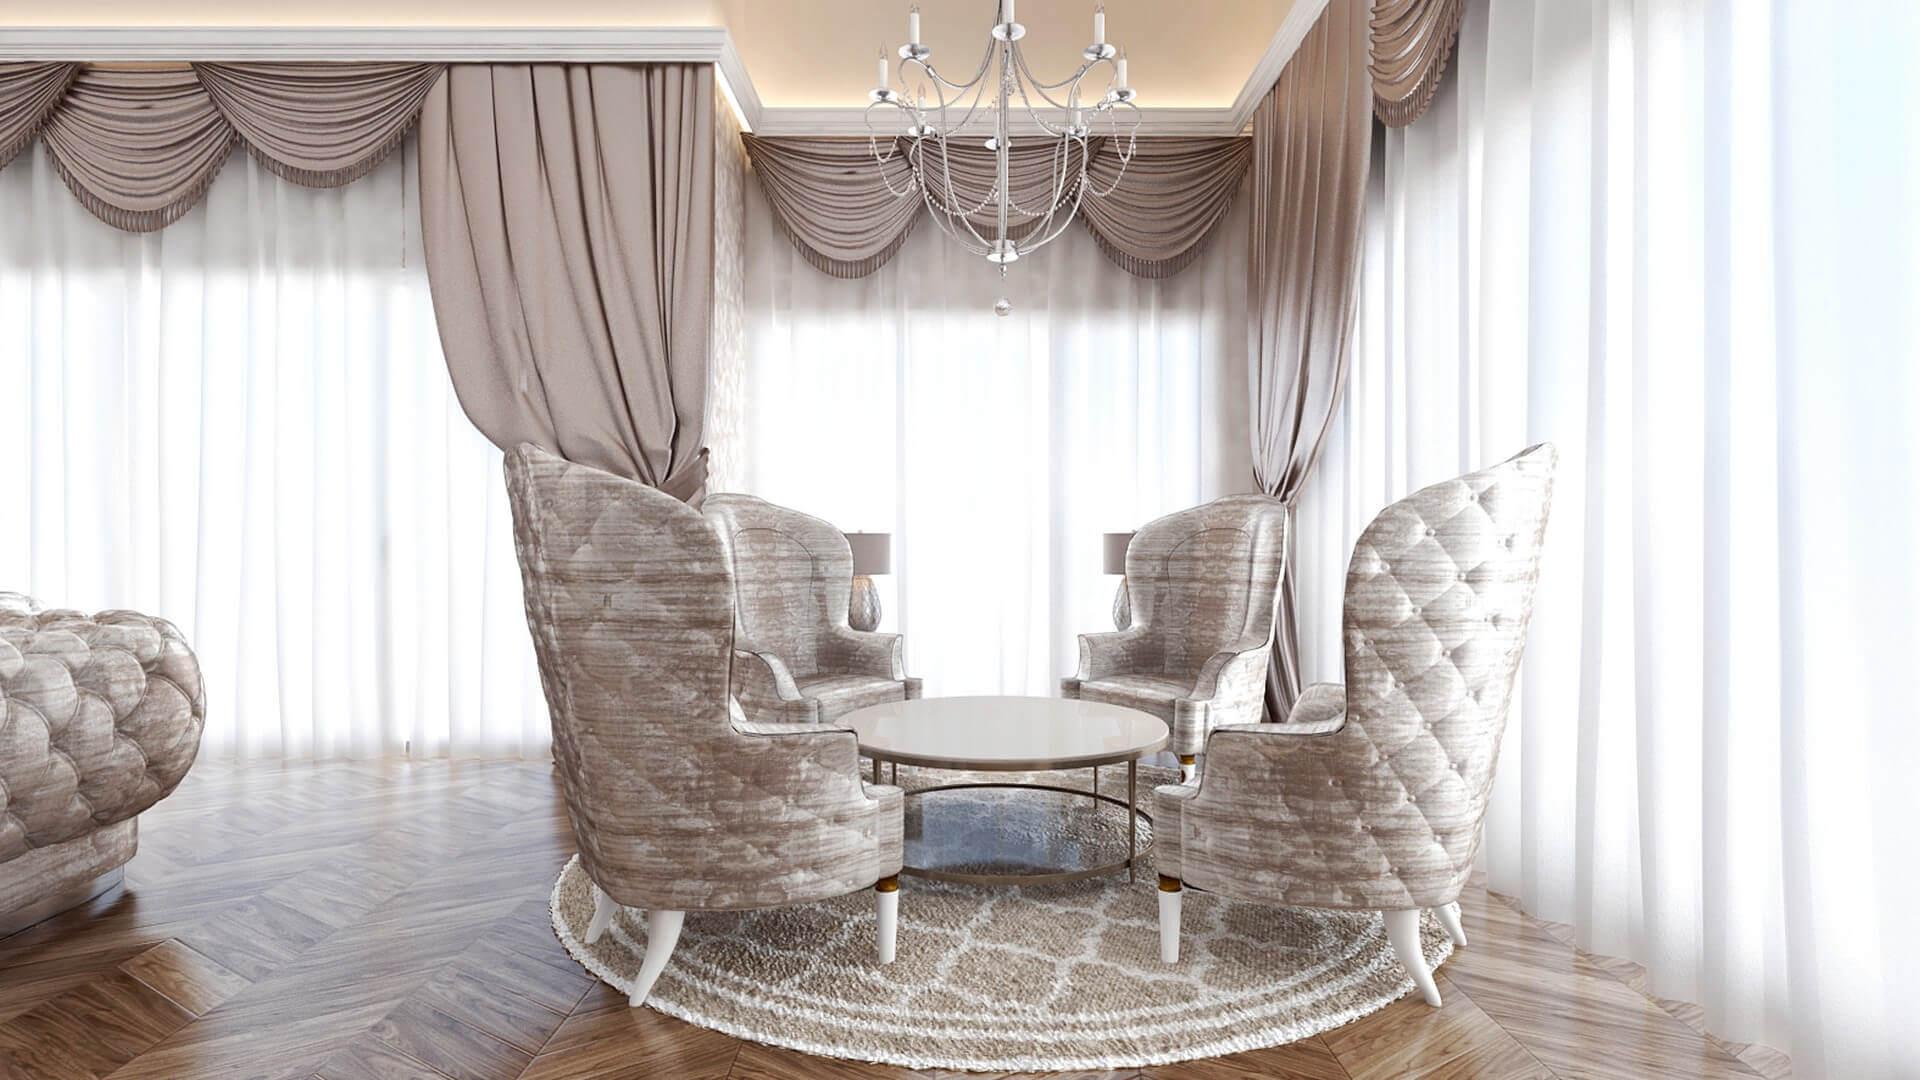 flat decoration 3290 S. Aslan Flat Residential